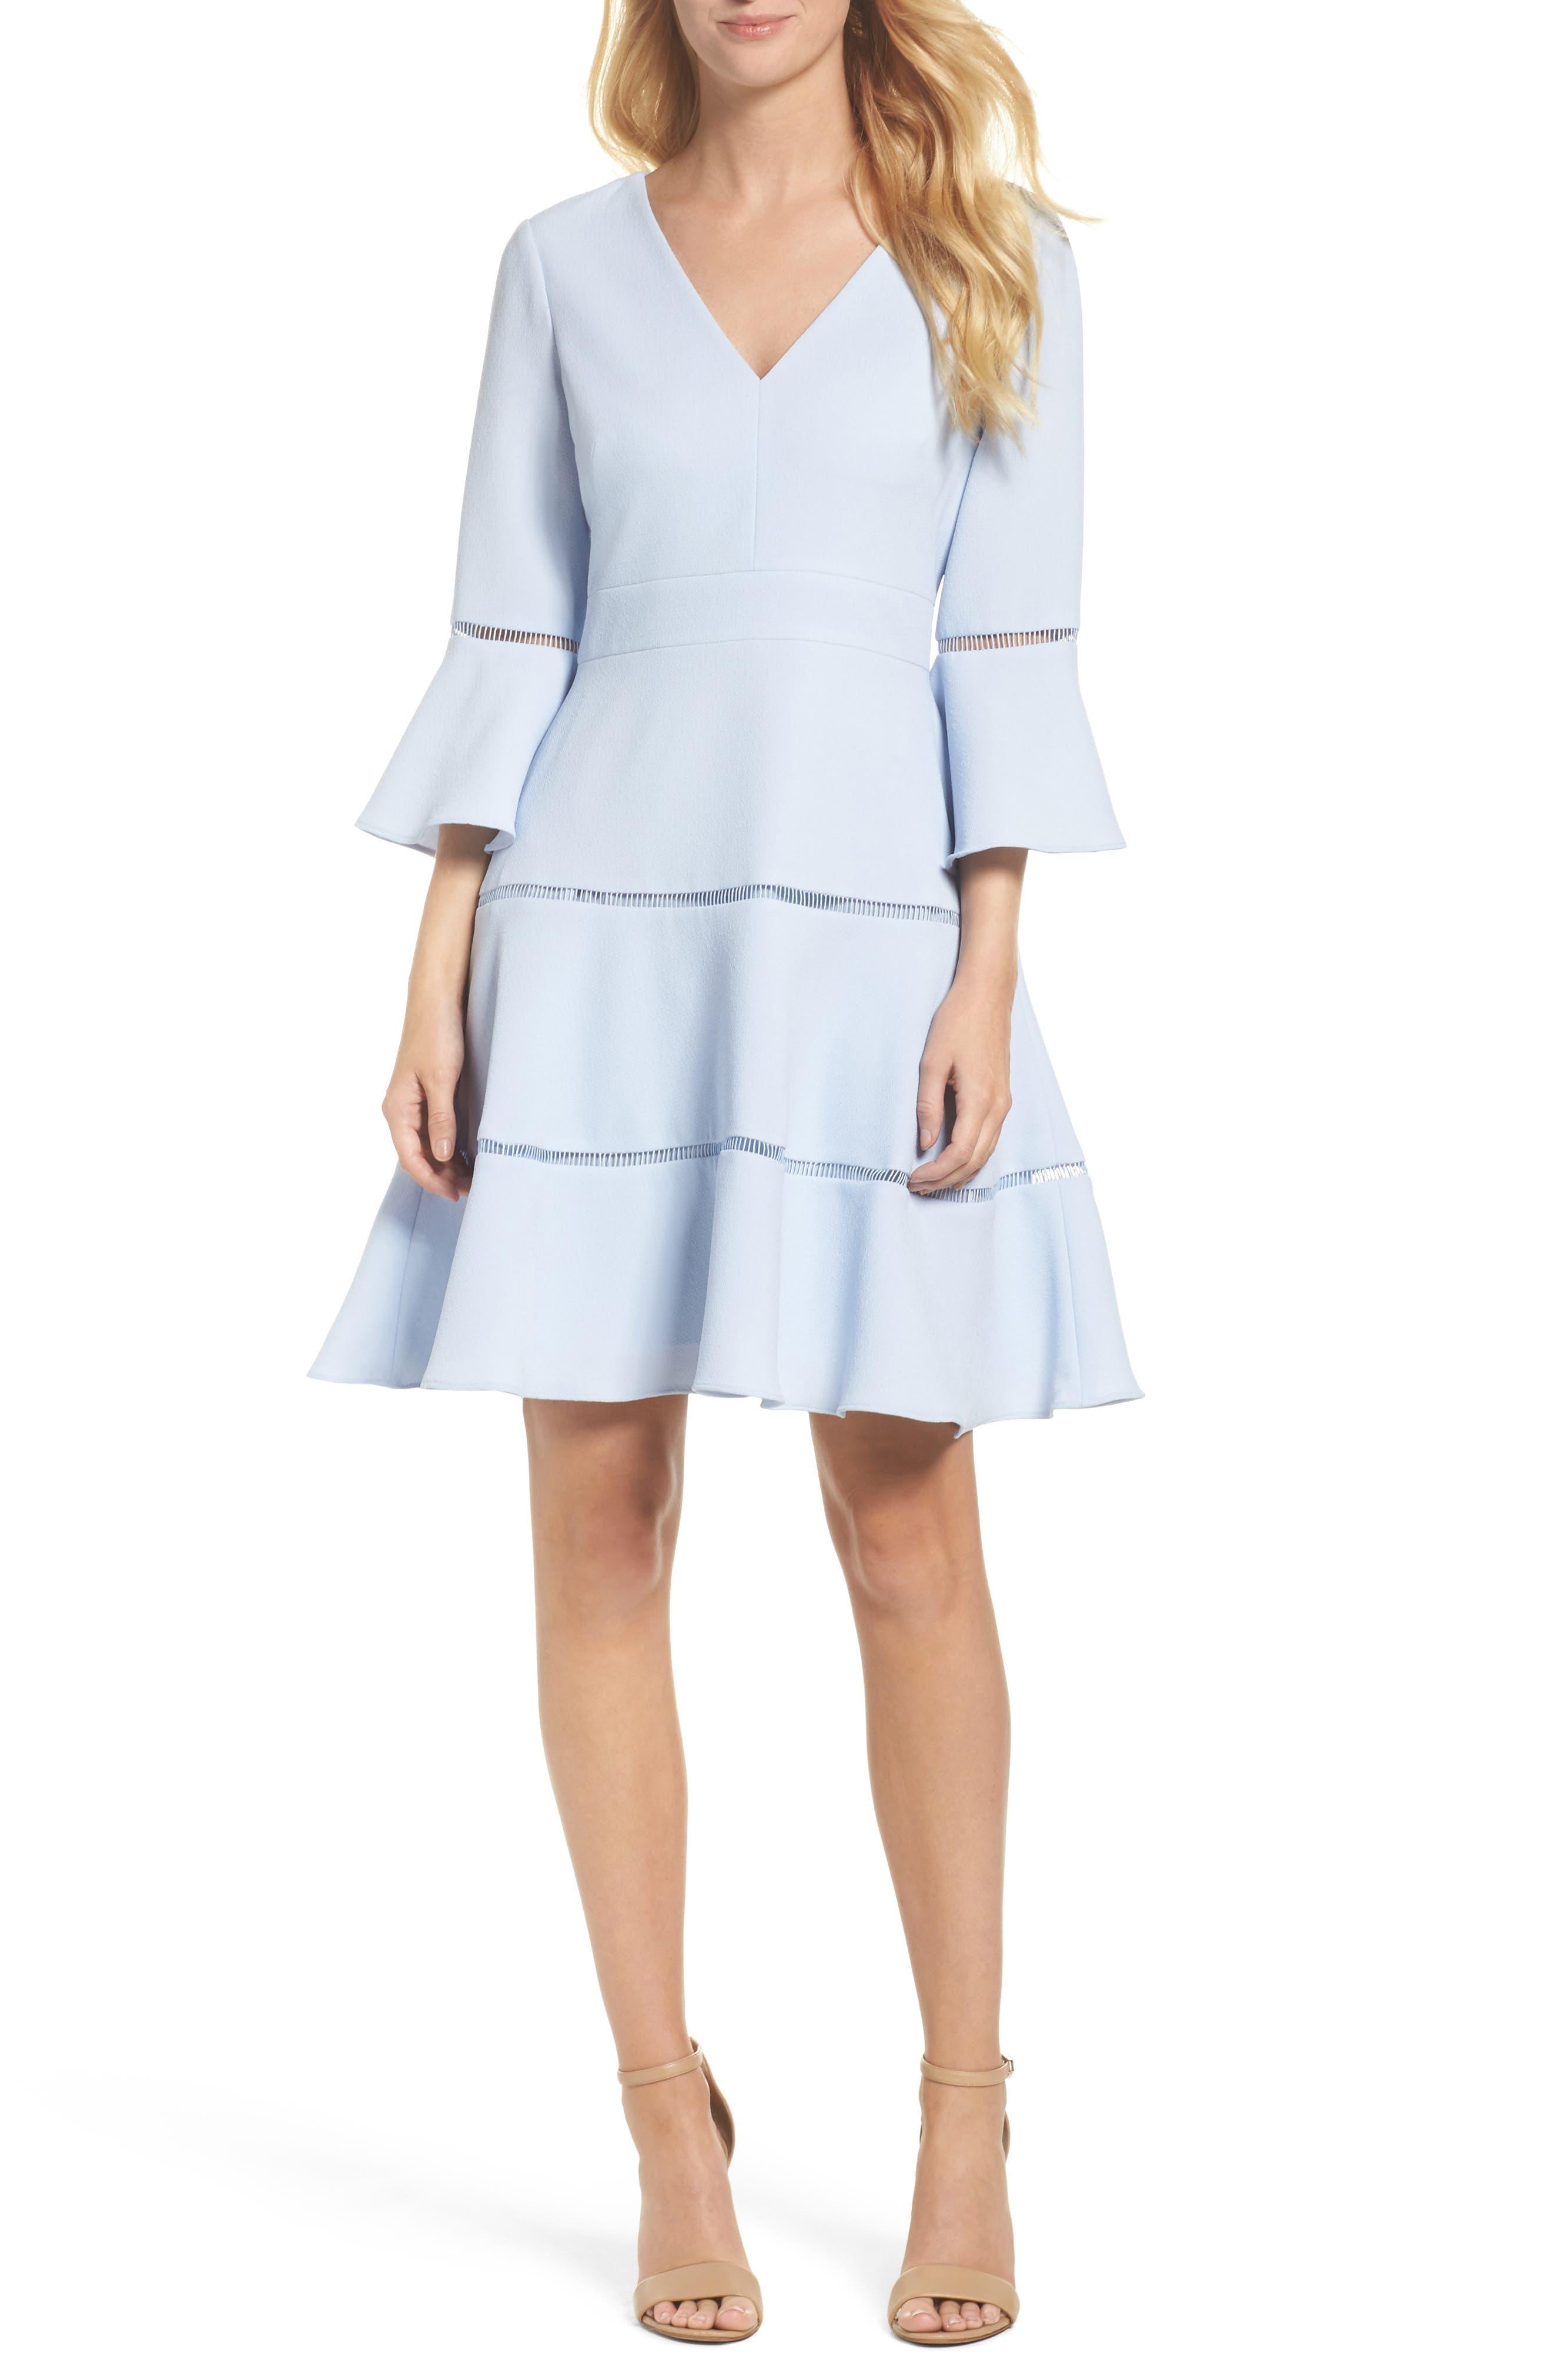 Alternate Image 1 Selected - Eliza J Lace Inset Fit & Flare Dress (Regular & Petite)